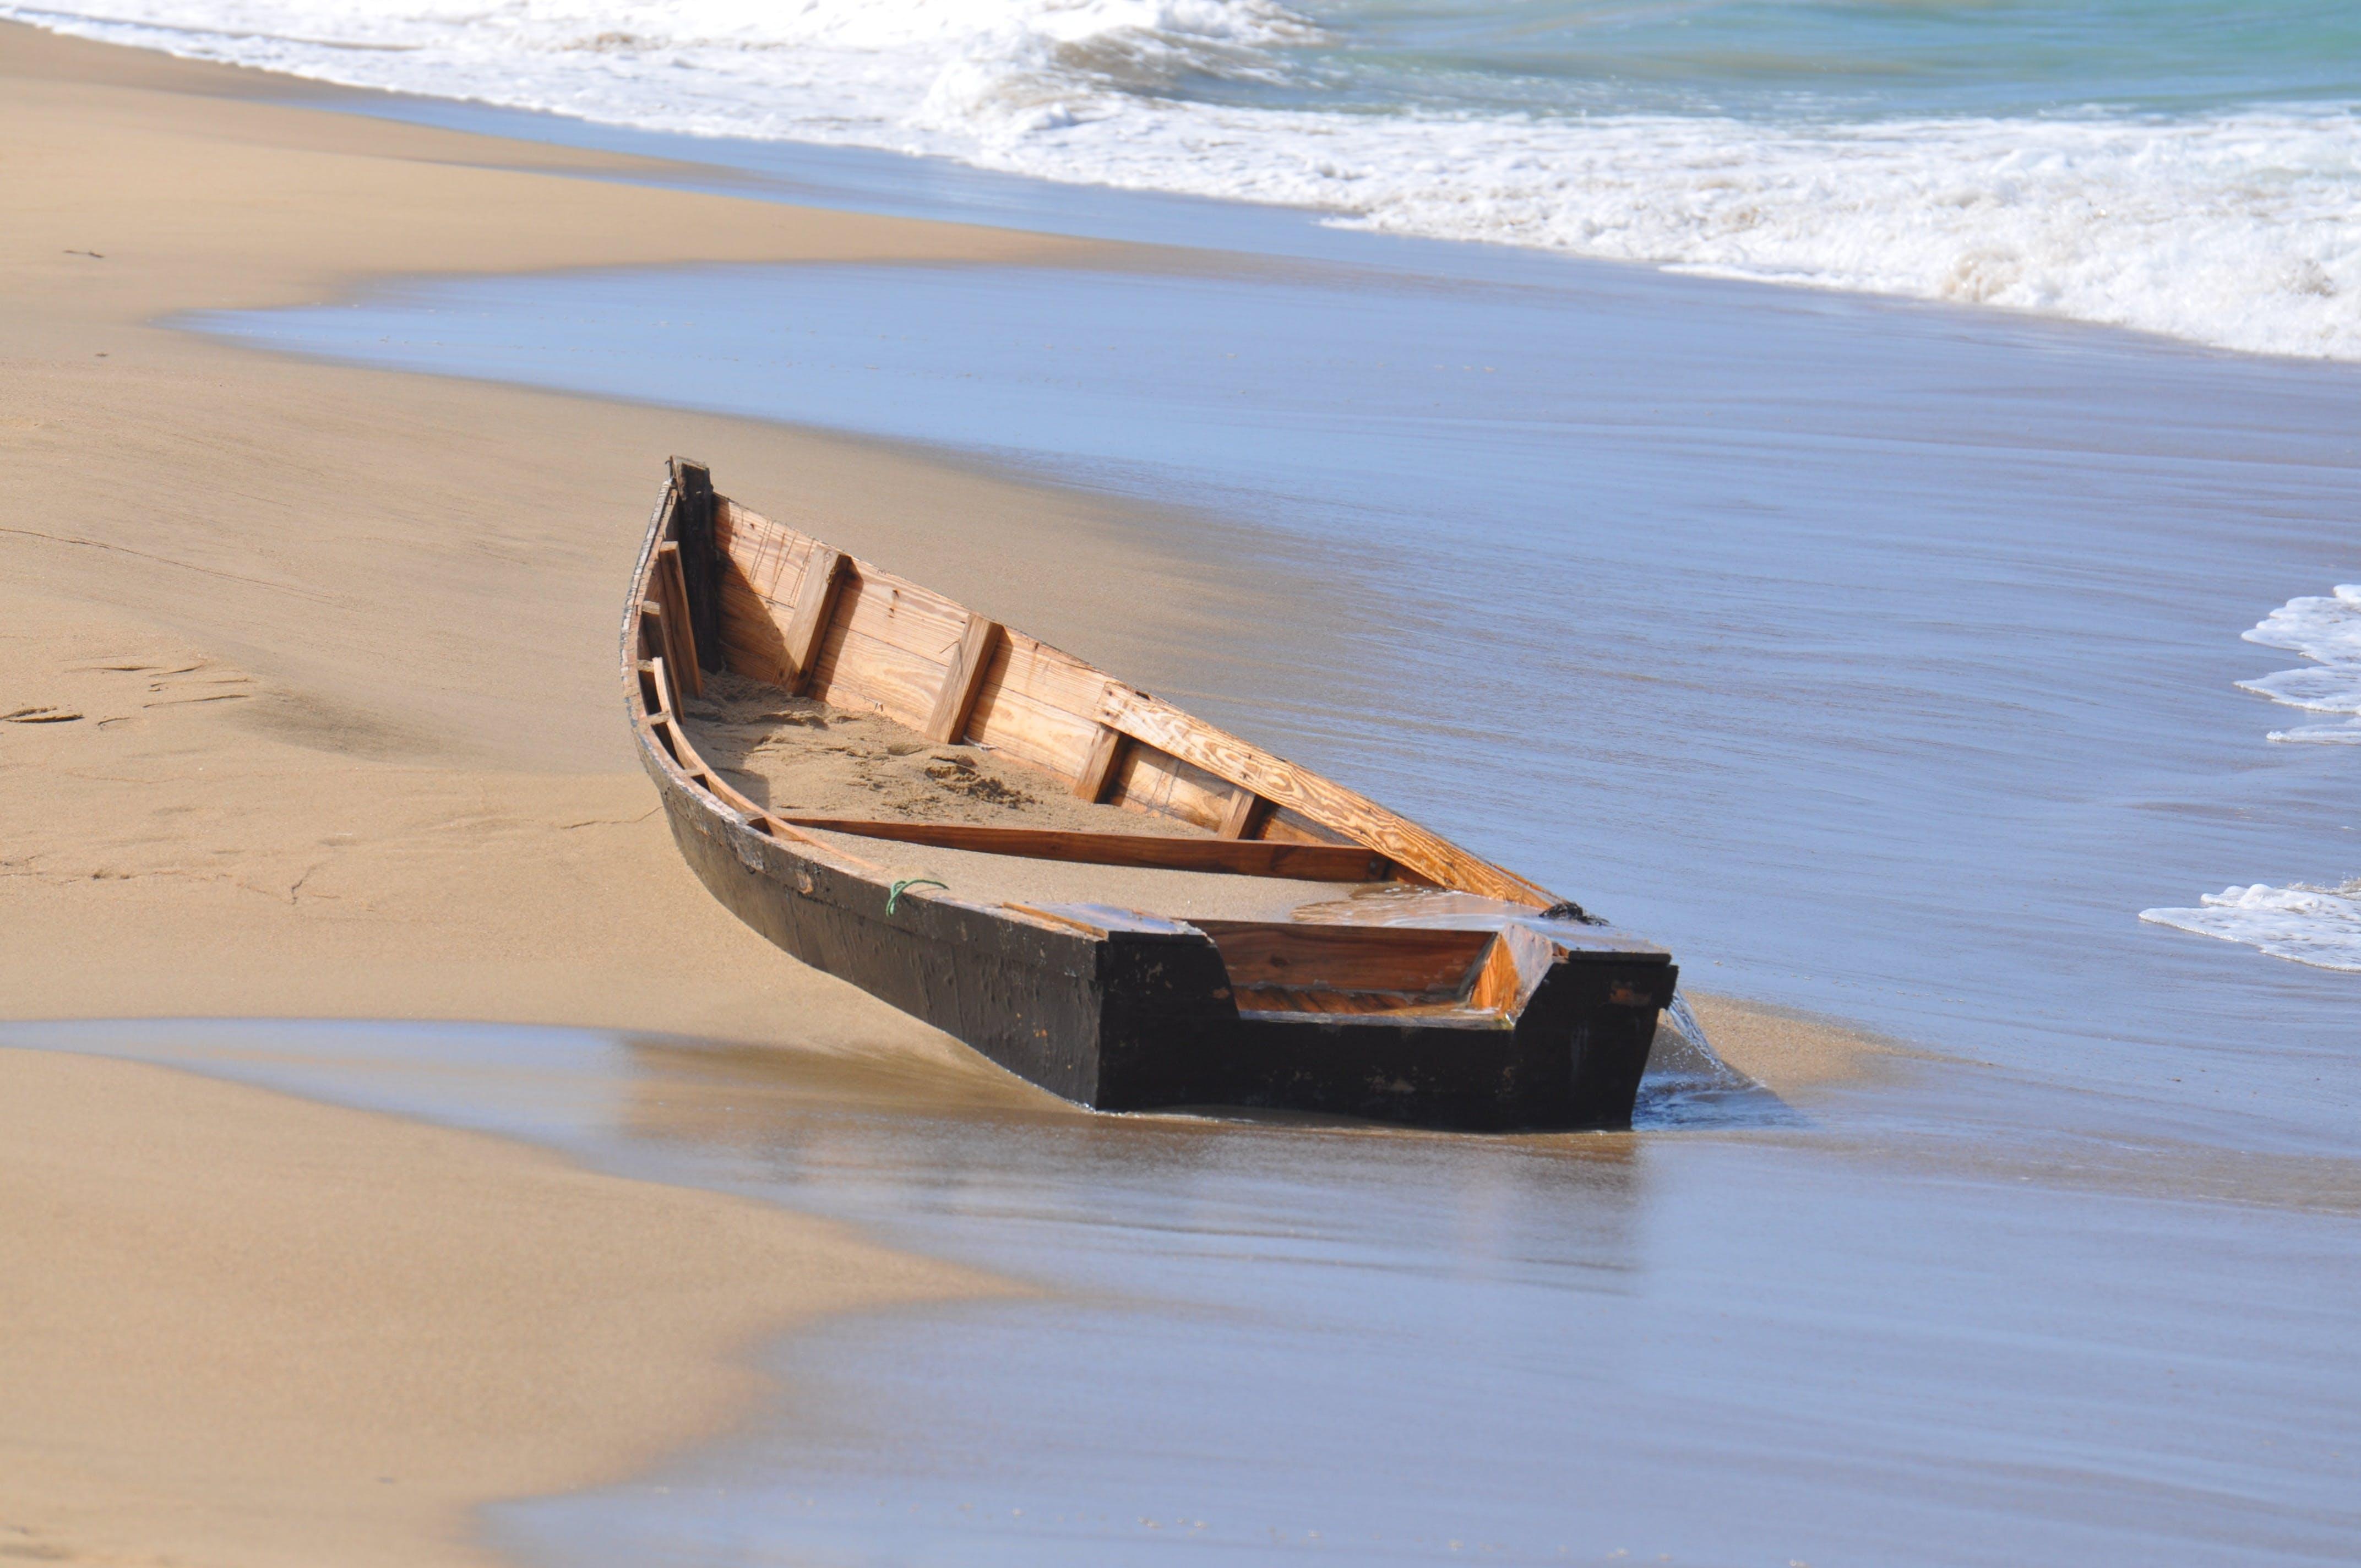 Free stock photo of sea, beach, sand, waves